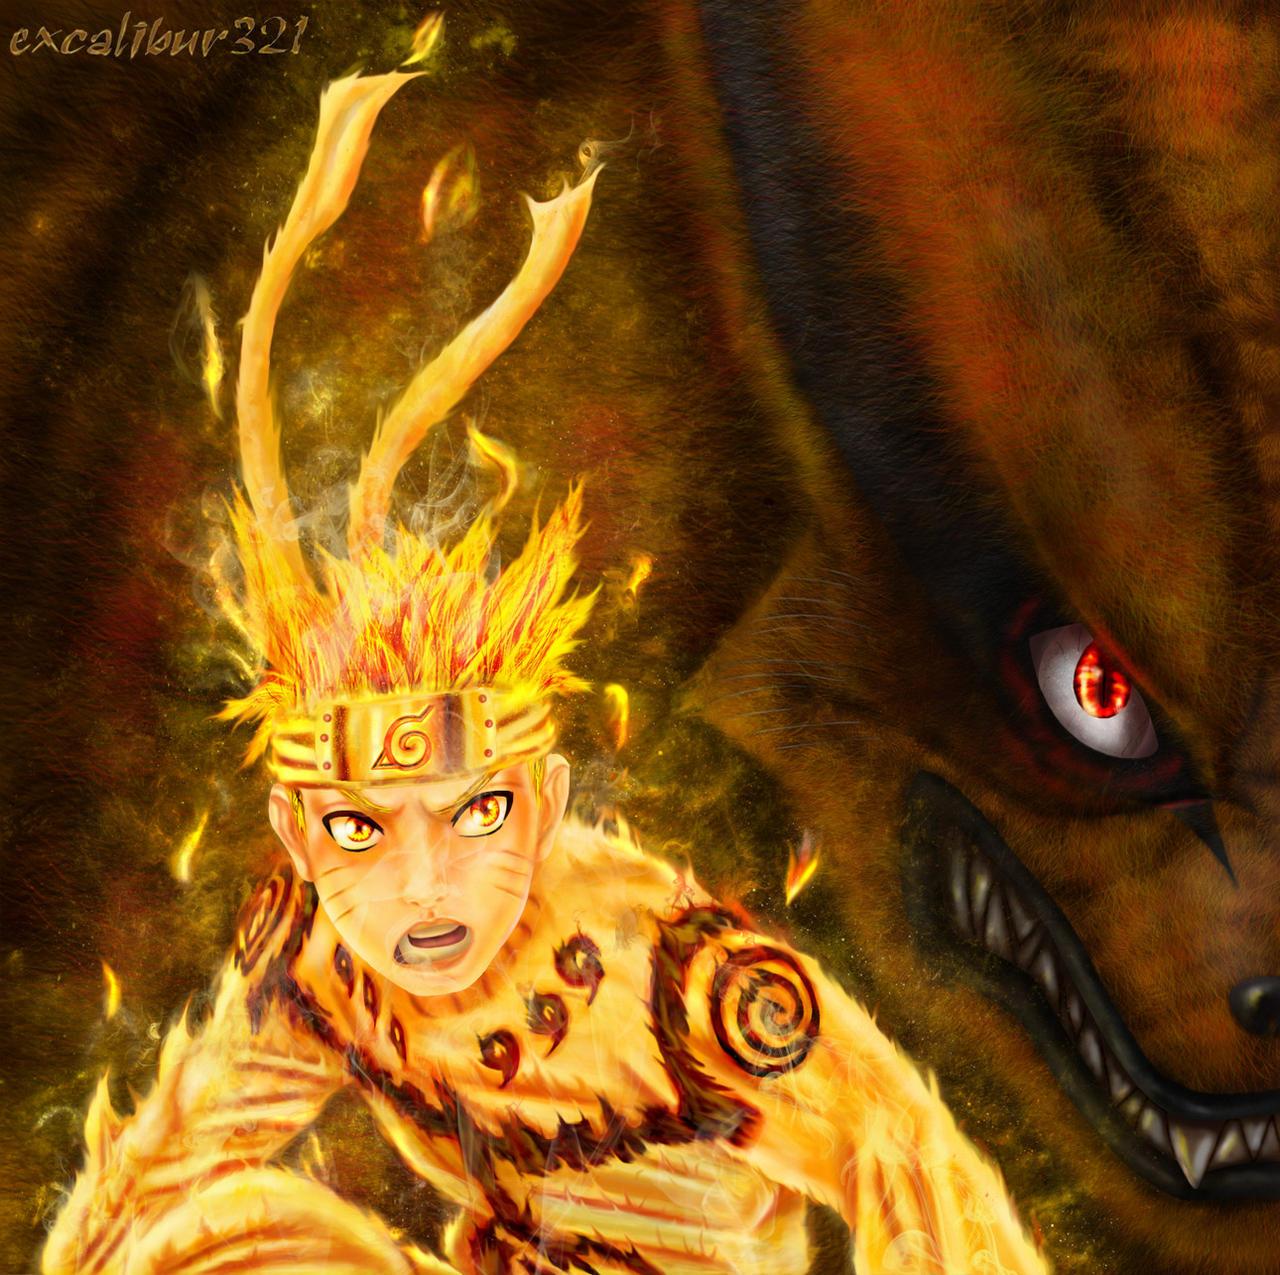 Naruto & Kurama  by excalibur321